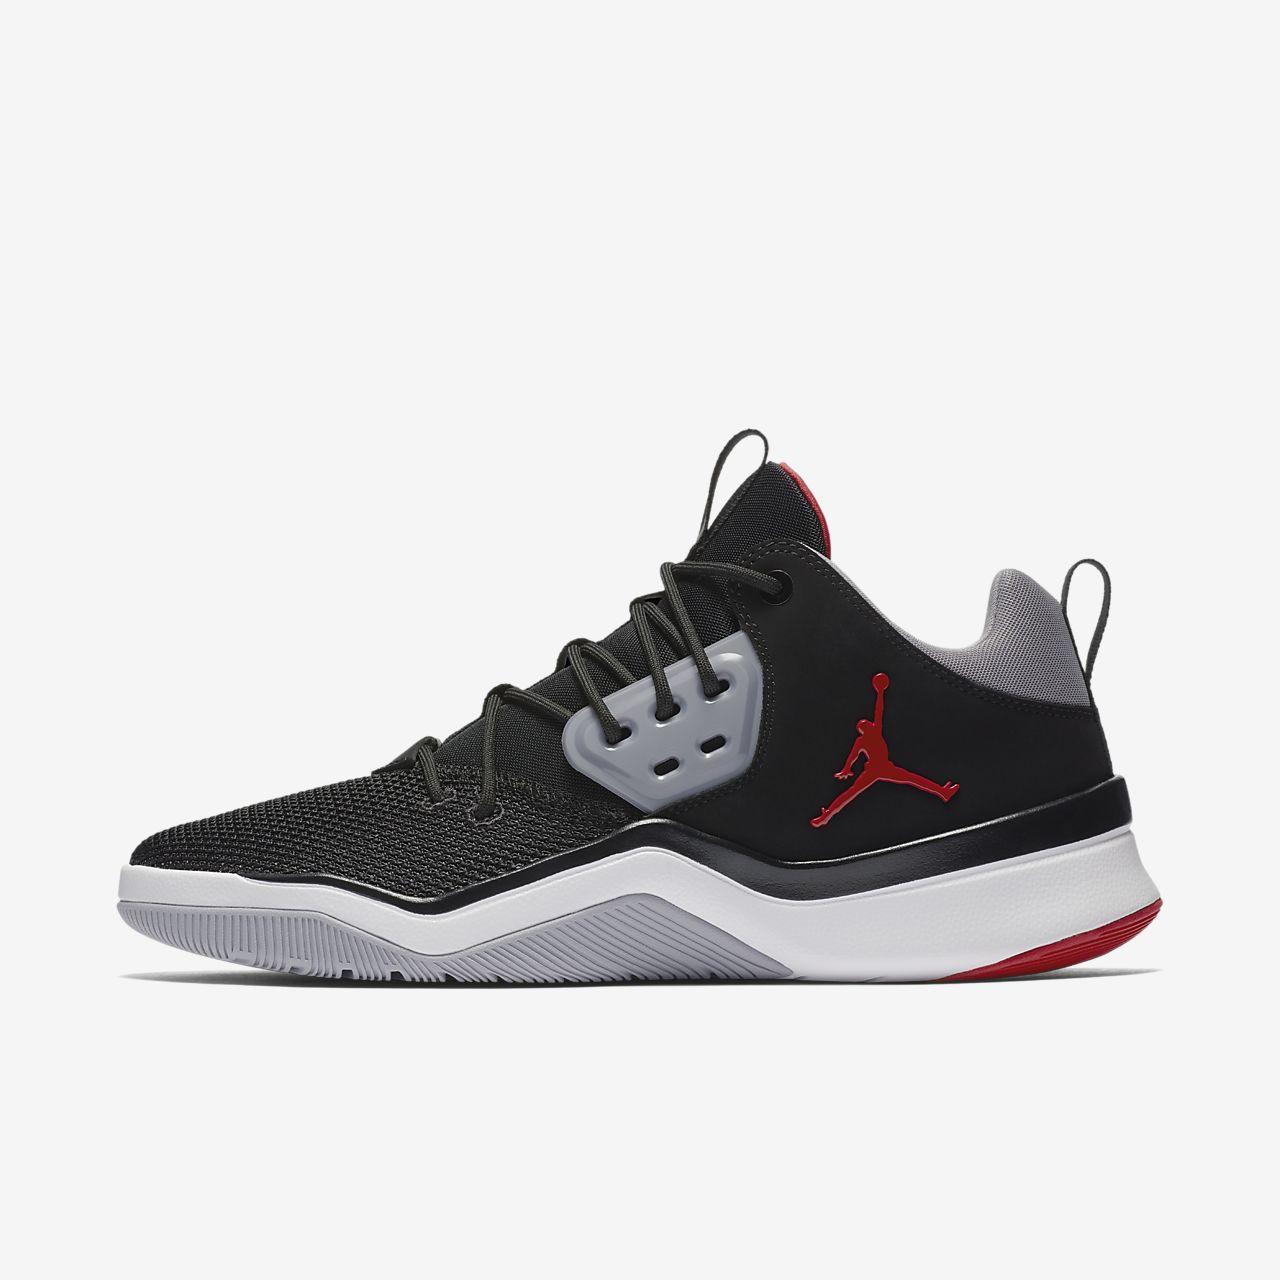 Chaussure Chaussure Jordan Jordan Dna Homme Pour Dna I6fmgvYb7y